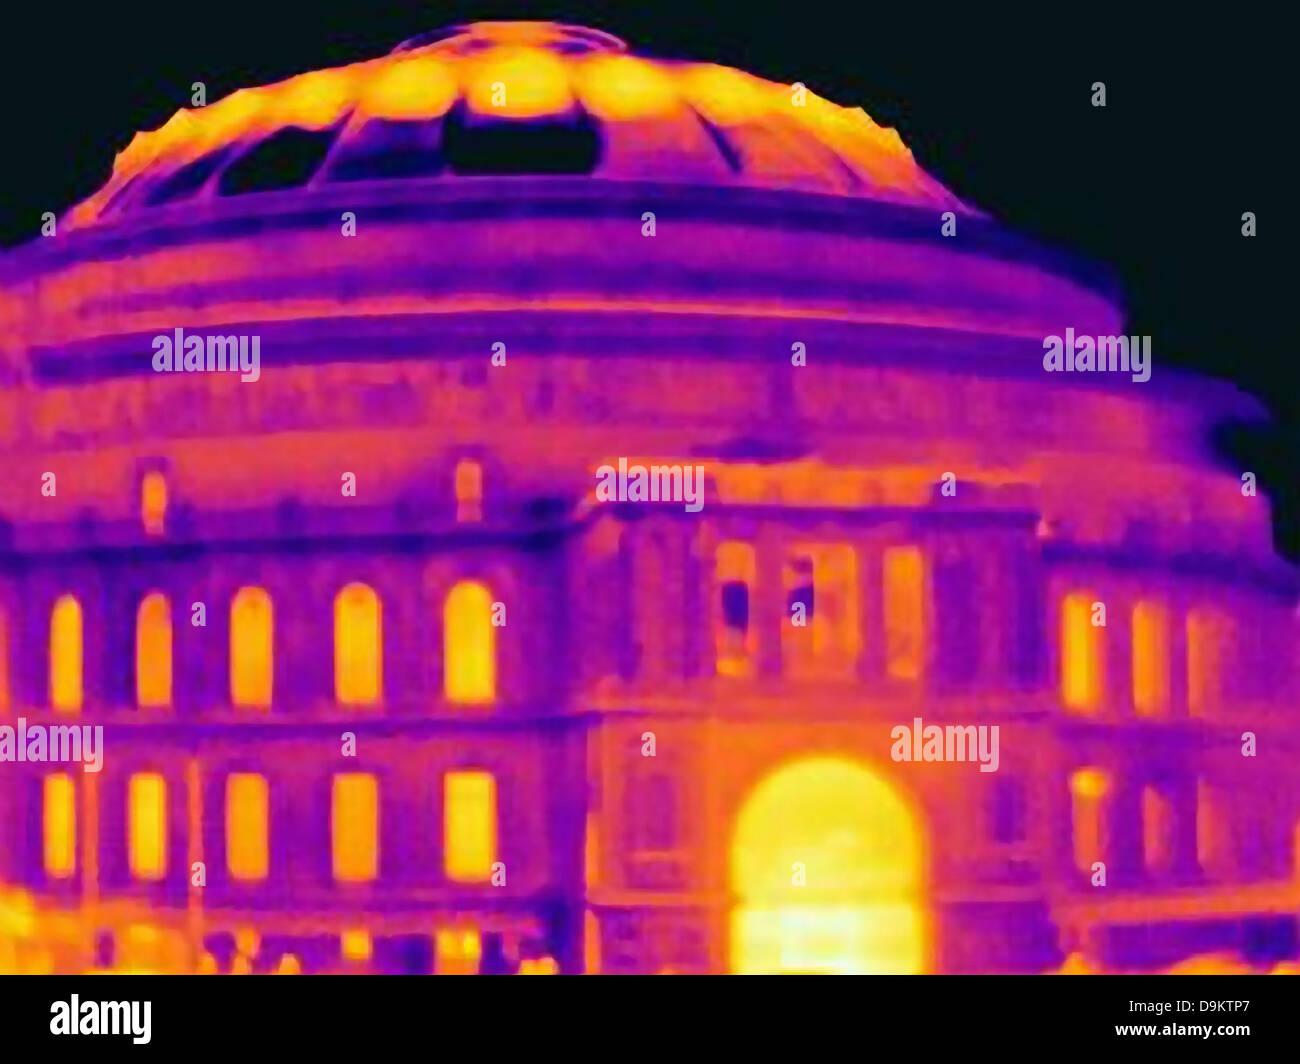 Ultraviolet light of Royal Albert Hall, London - Stock Image